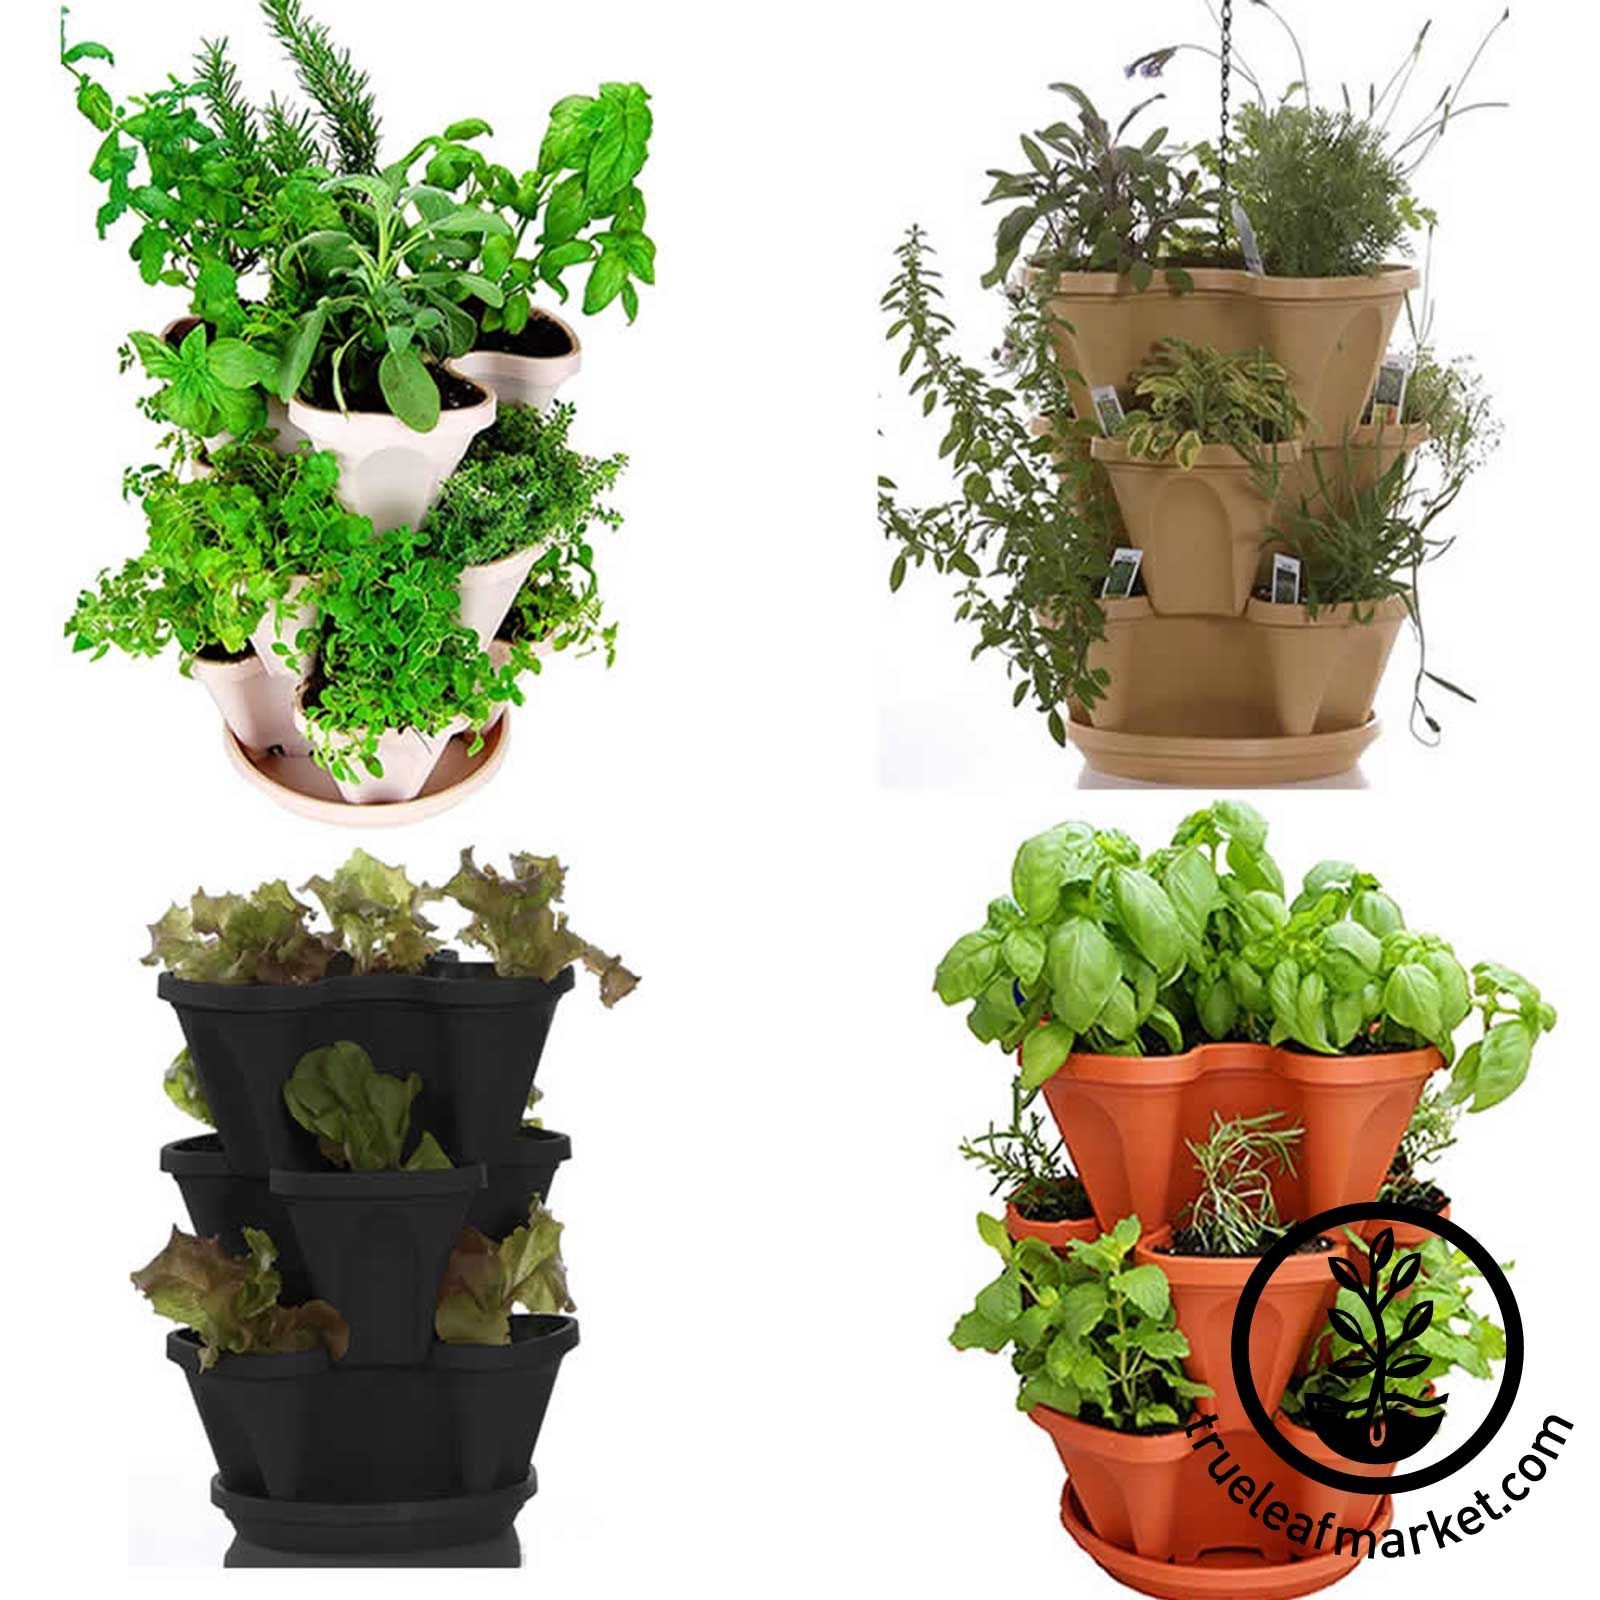 Culinary Herb Garden Kit U0026 Stackable Planter | Grow Cooking Herbs